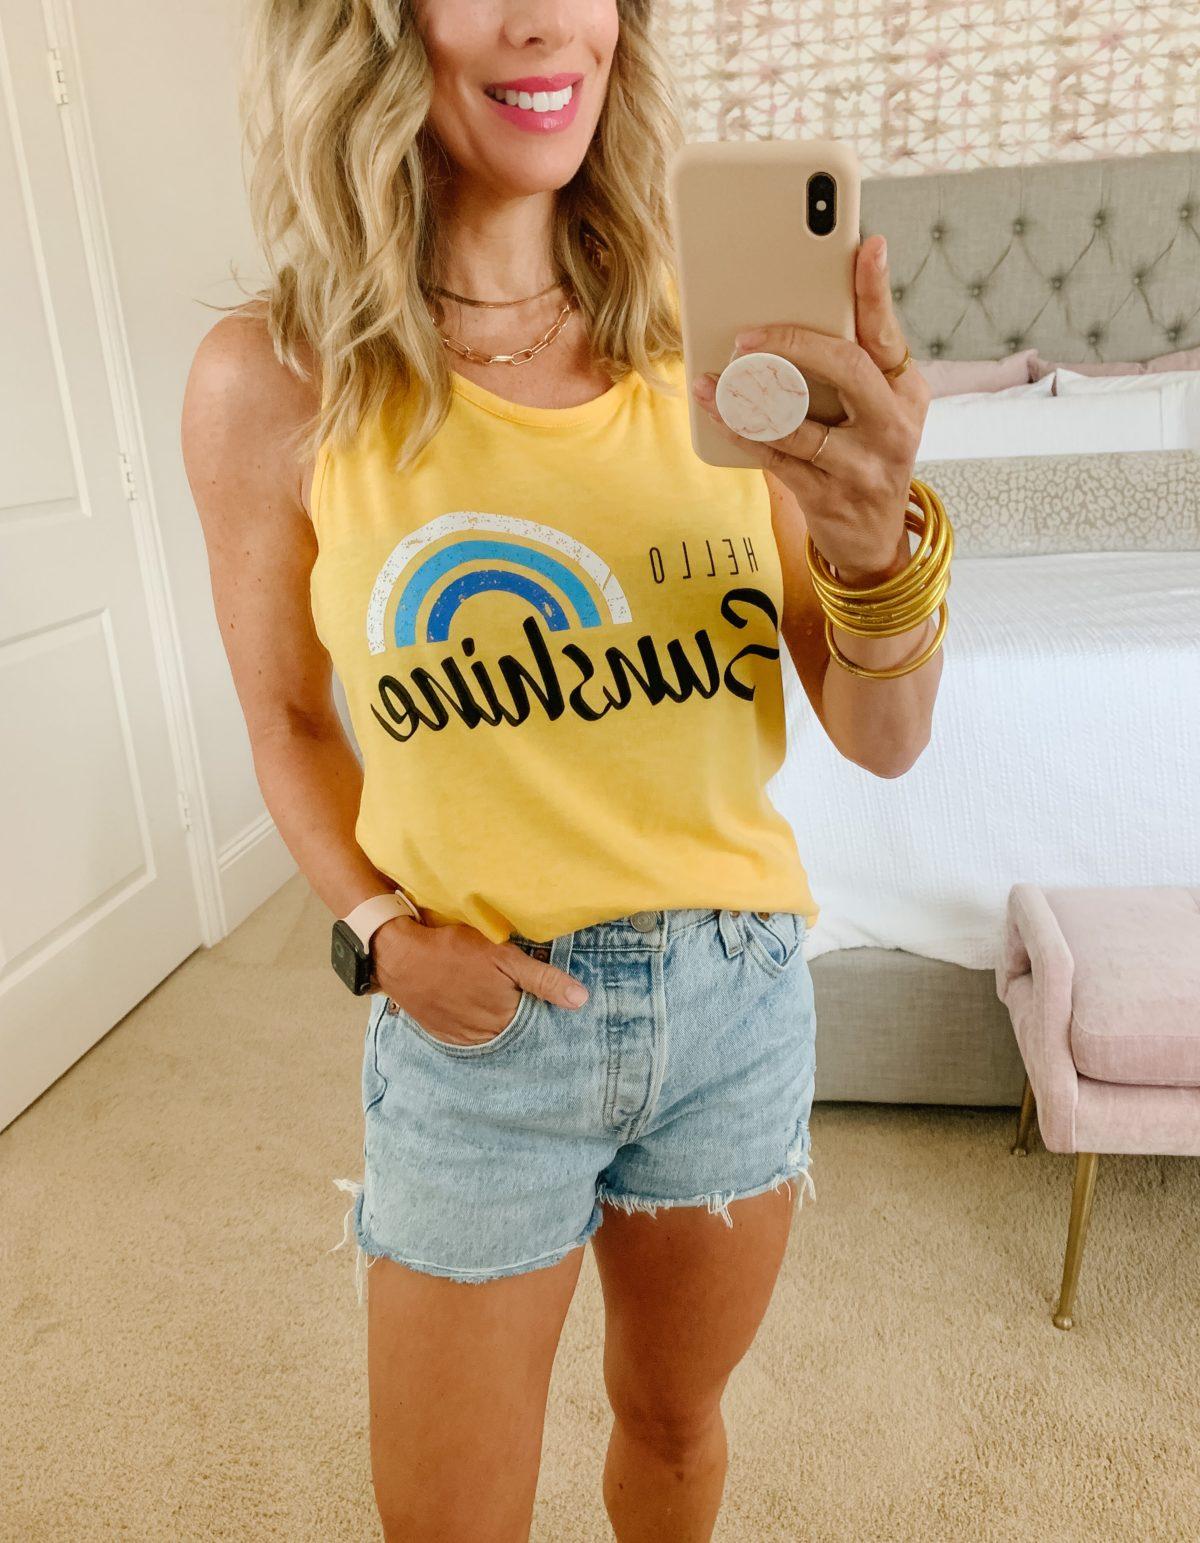 Amazon Fashion Faves, Sunshine Tank, Jeans Shorts